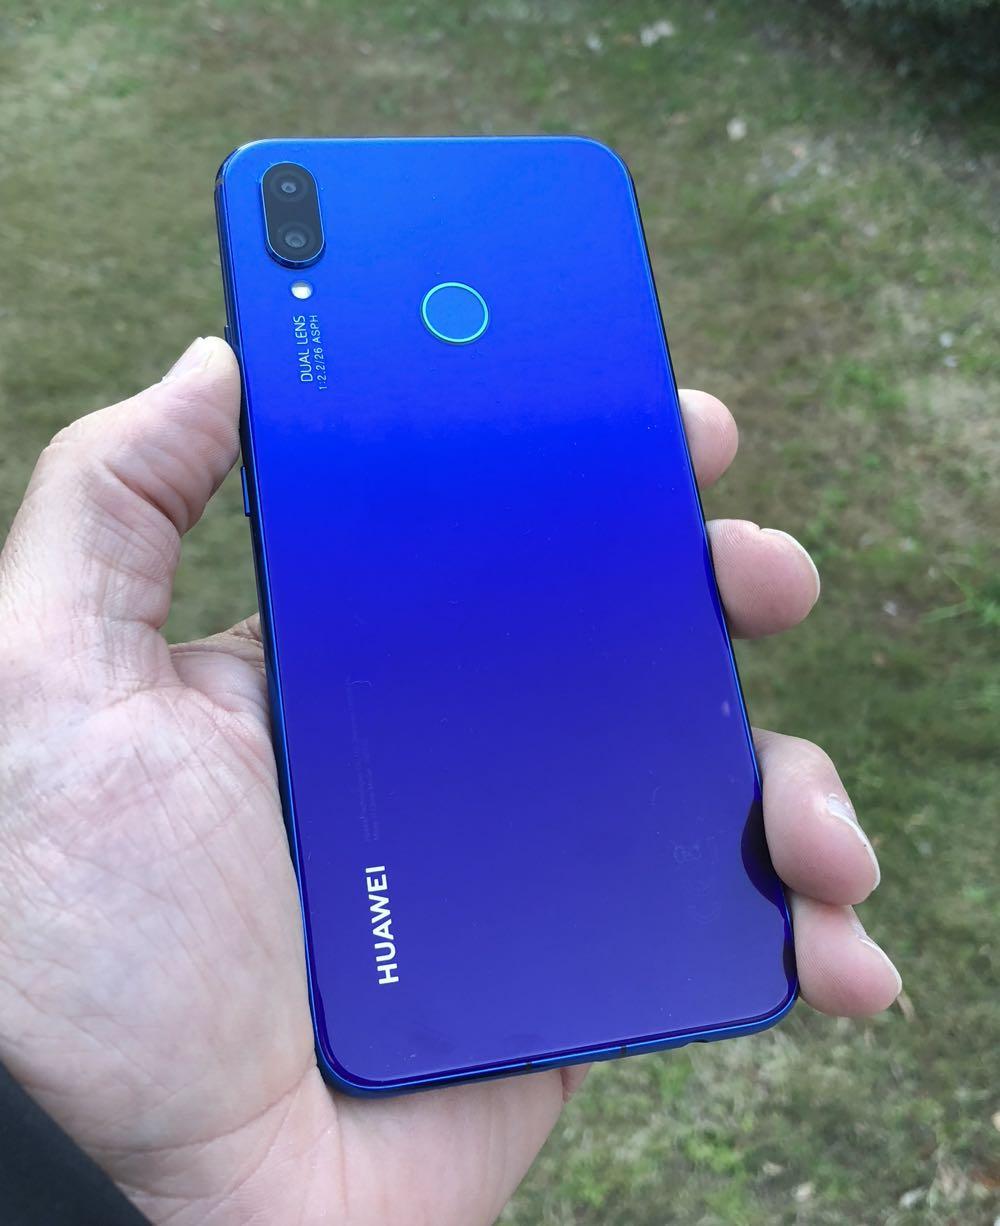 Huawei Nova 3i smartphone review - top-shelf features